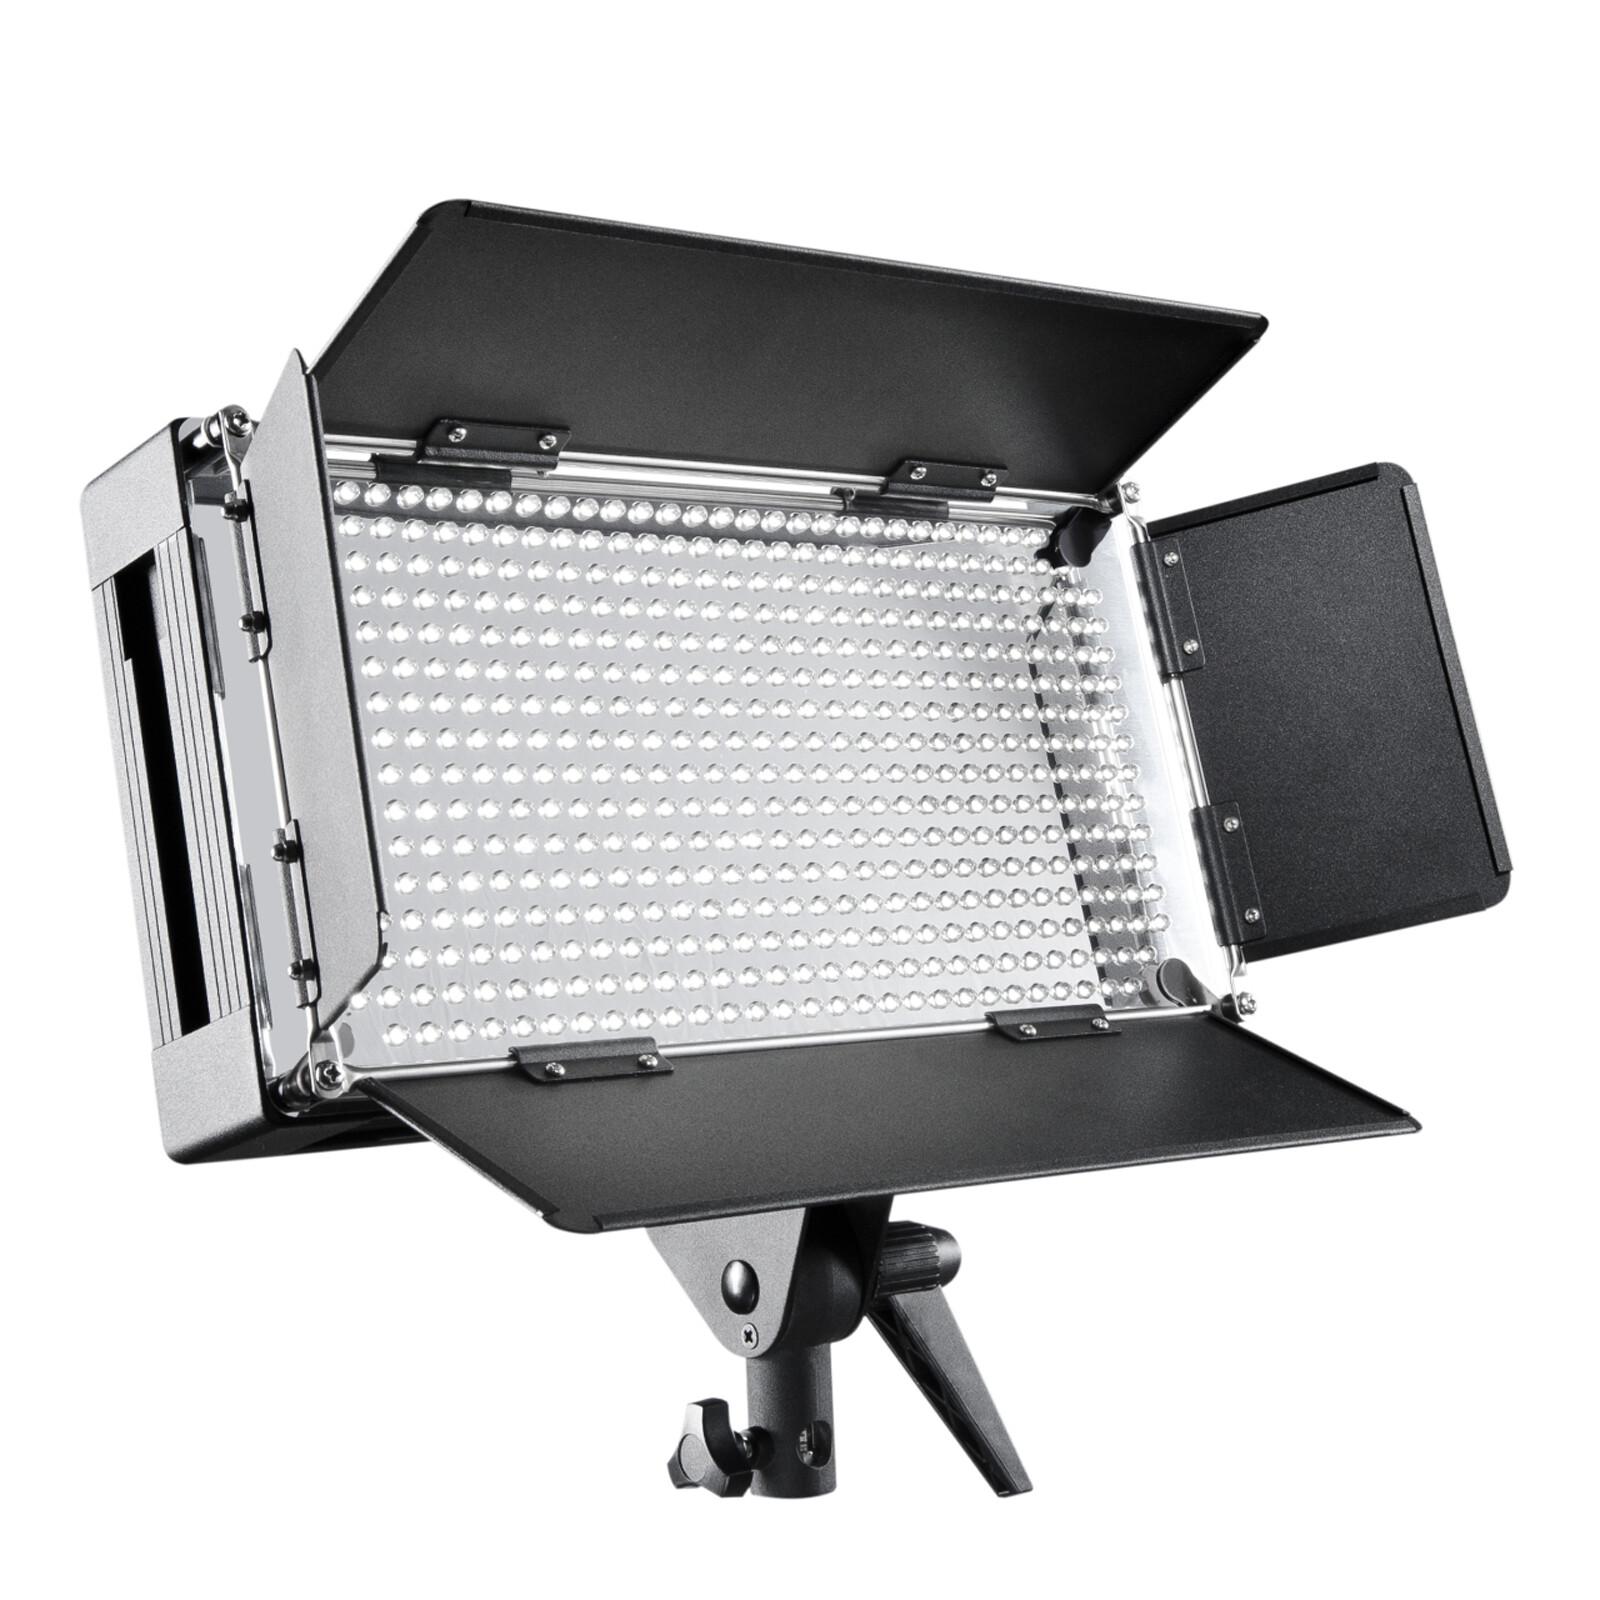 walimex pro LED 500 Artdirector dimmbar